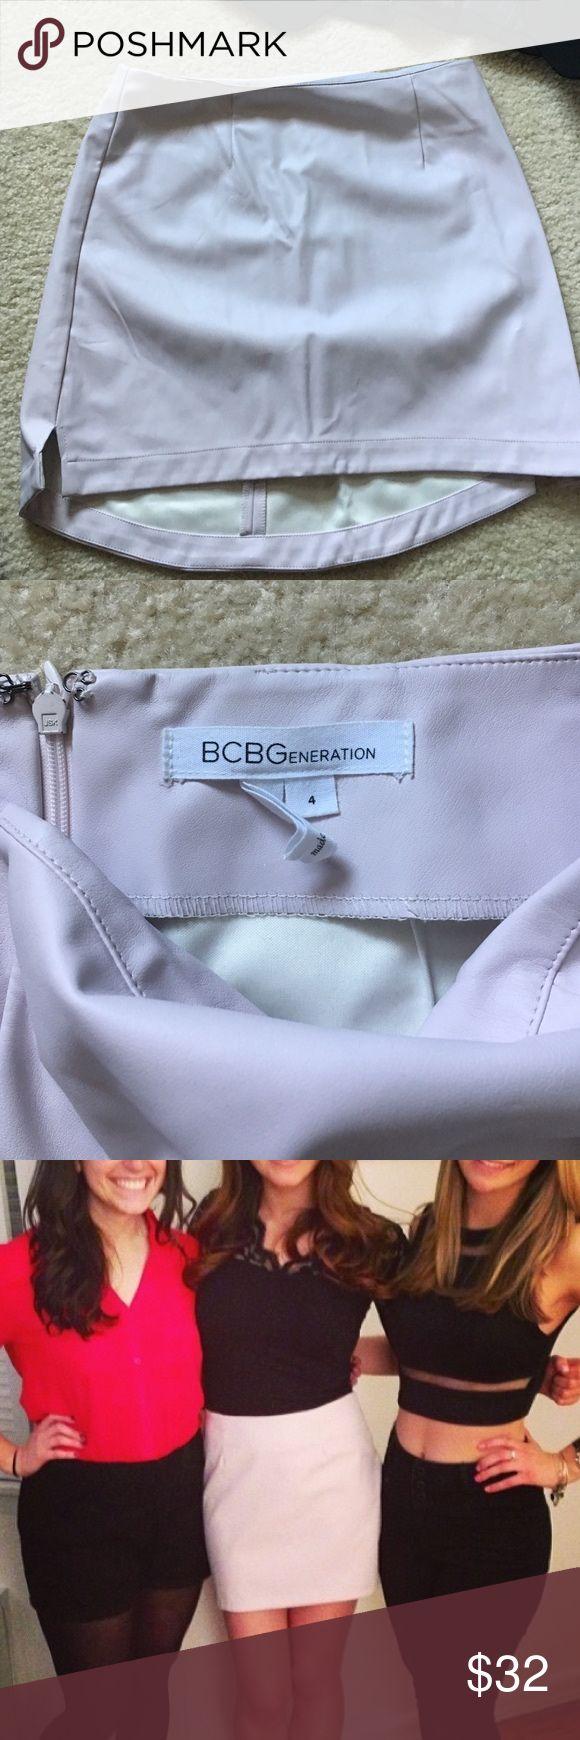 BCBG faux leather light pink skirt. BCBG faux leather light pink skirt, slightly high low for coverage with zipper on back. BCBGeneration Skirts Mini